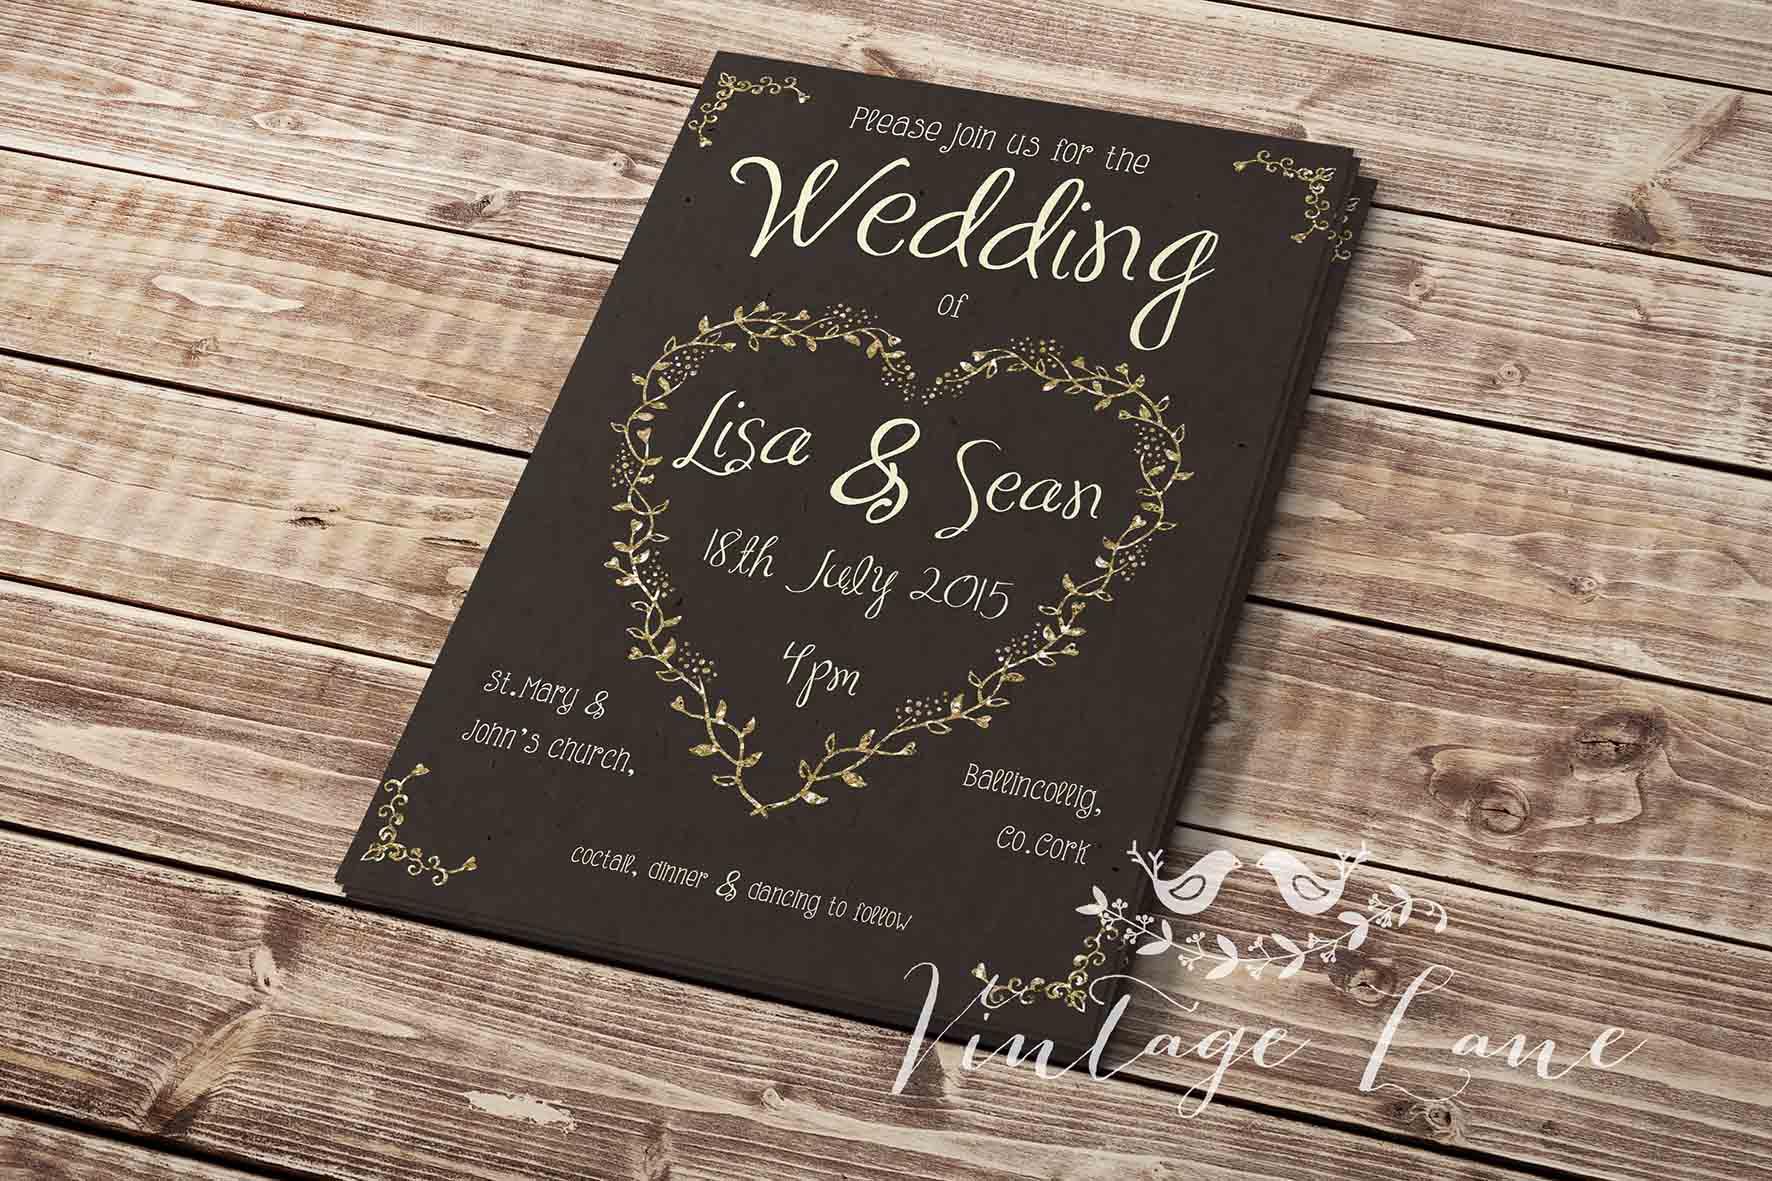 wedding invitations ireland budget Archives - Vintage Lane